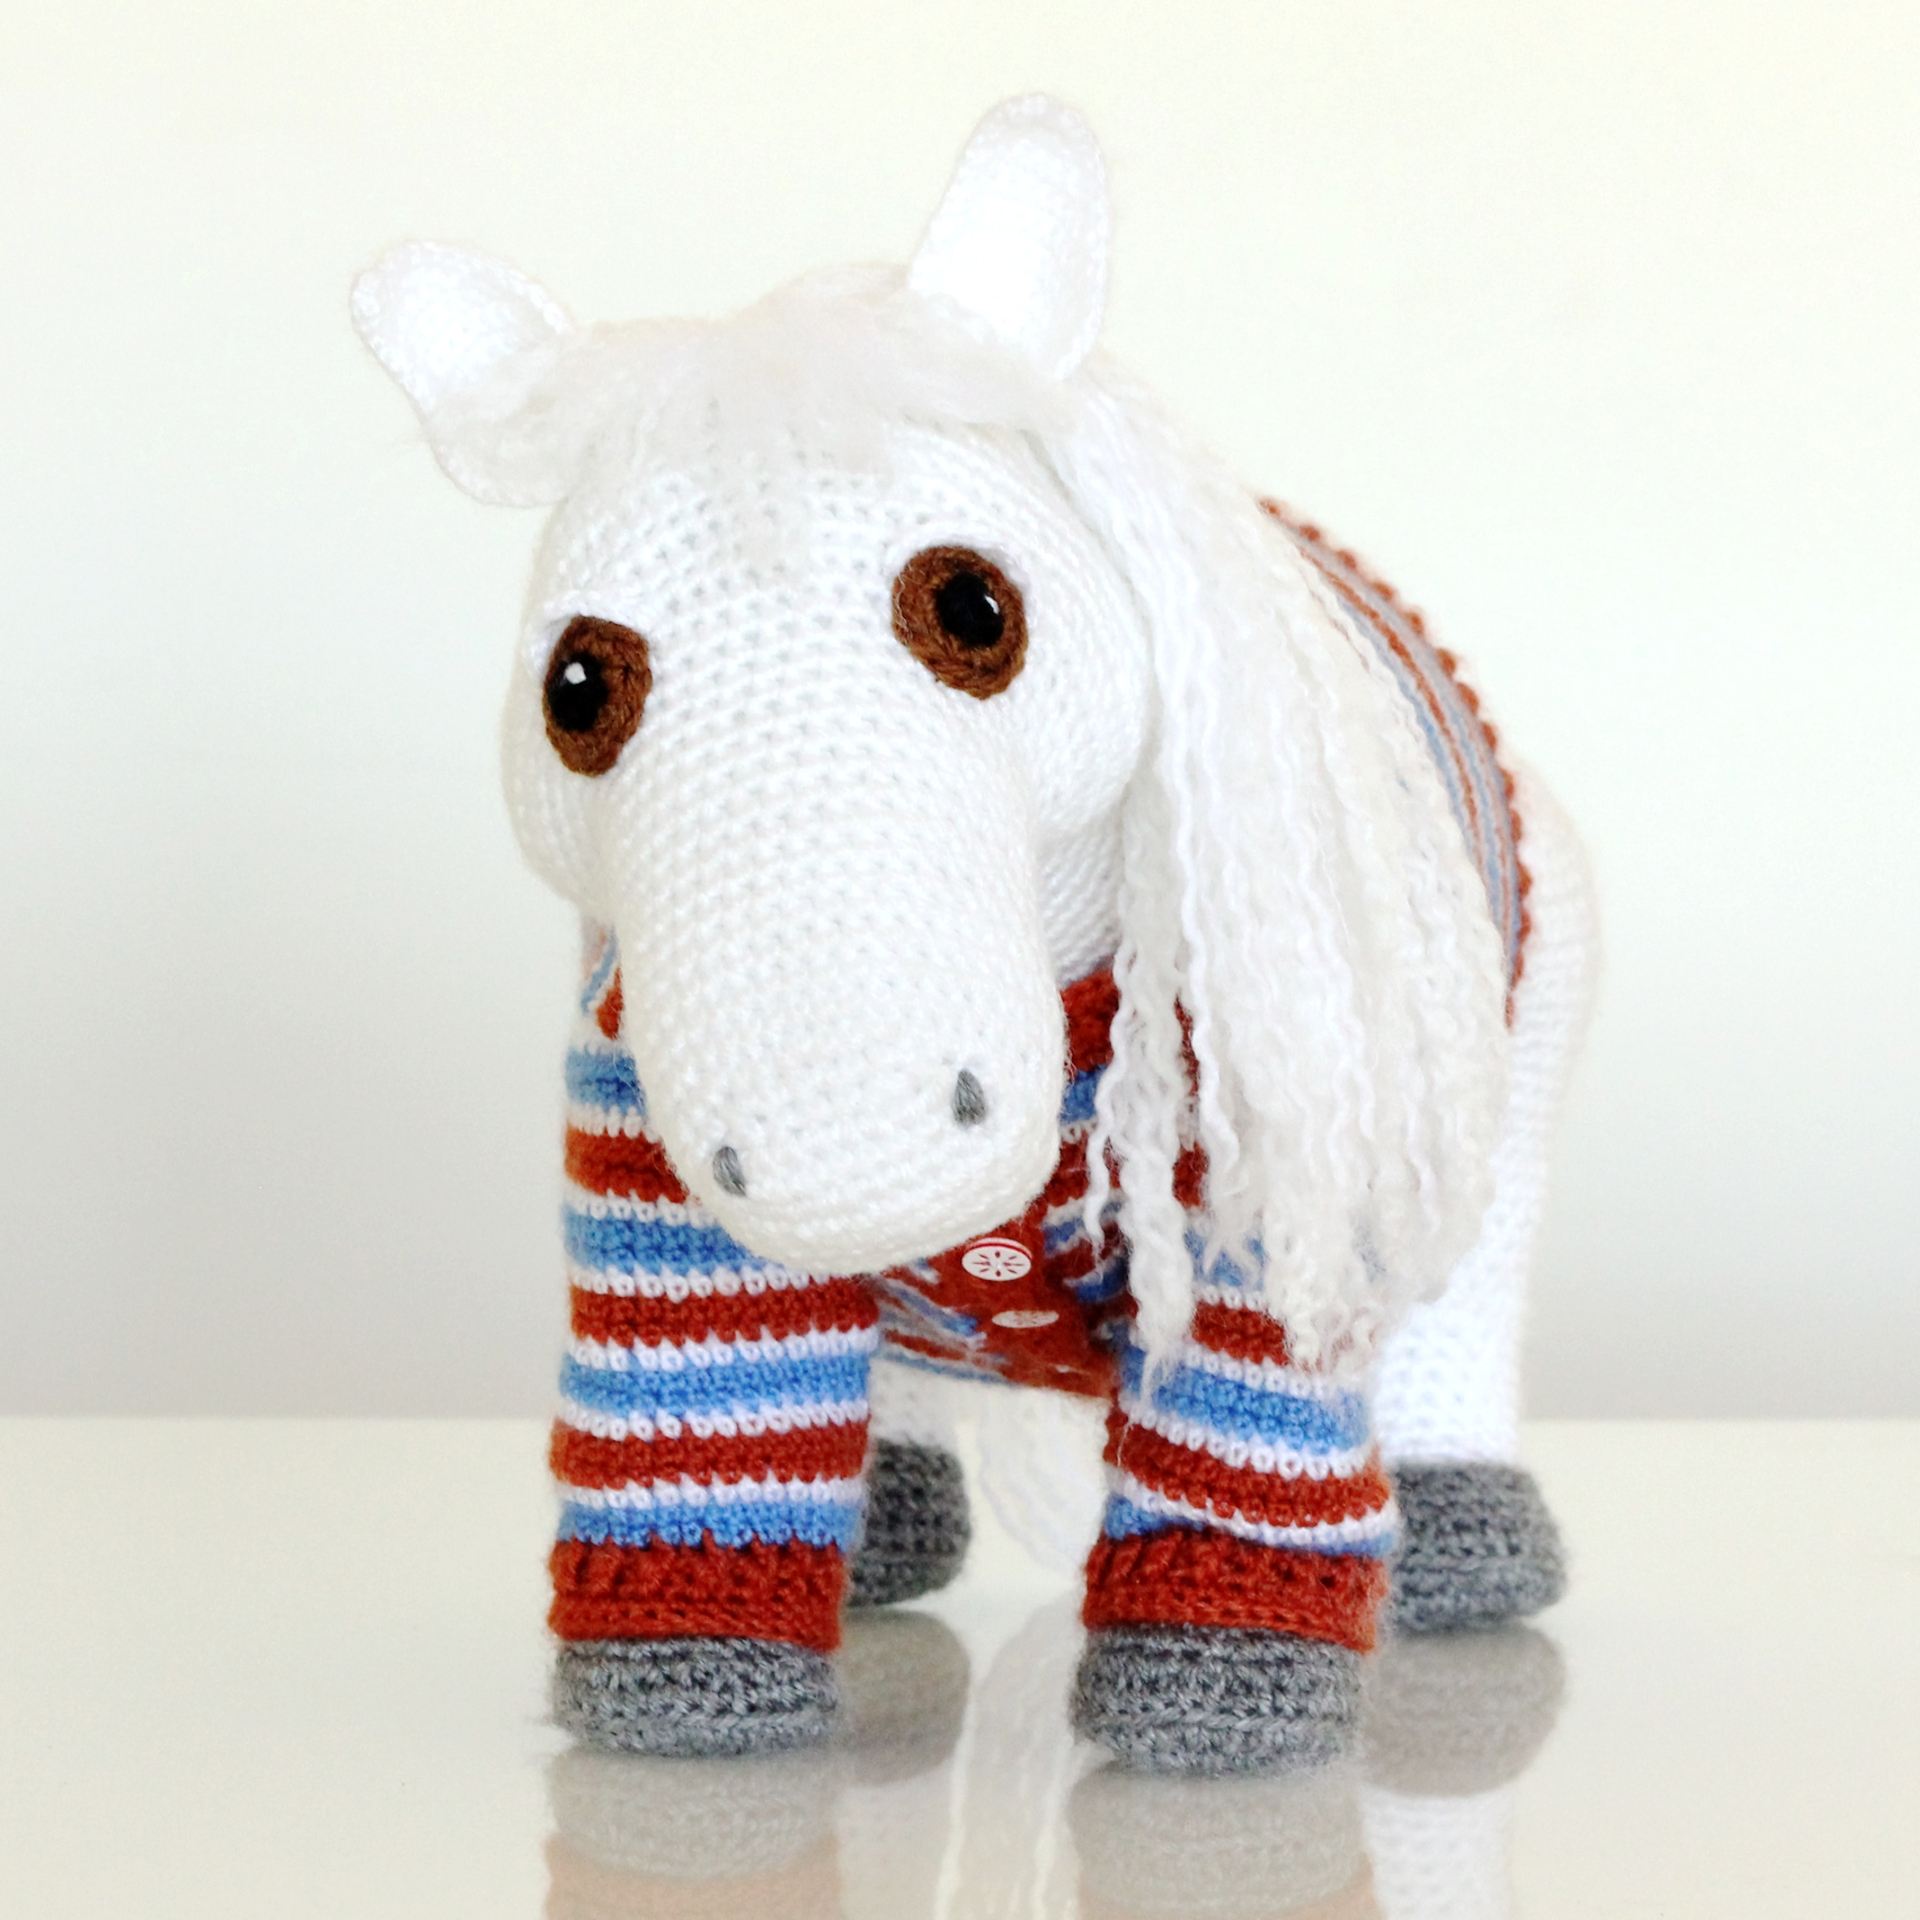 Amigurumi Jacket Crochet Pattern | Crochet baby cardigan free ... | 1920x1920